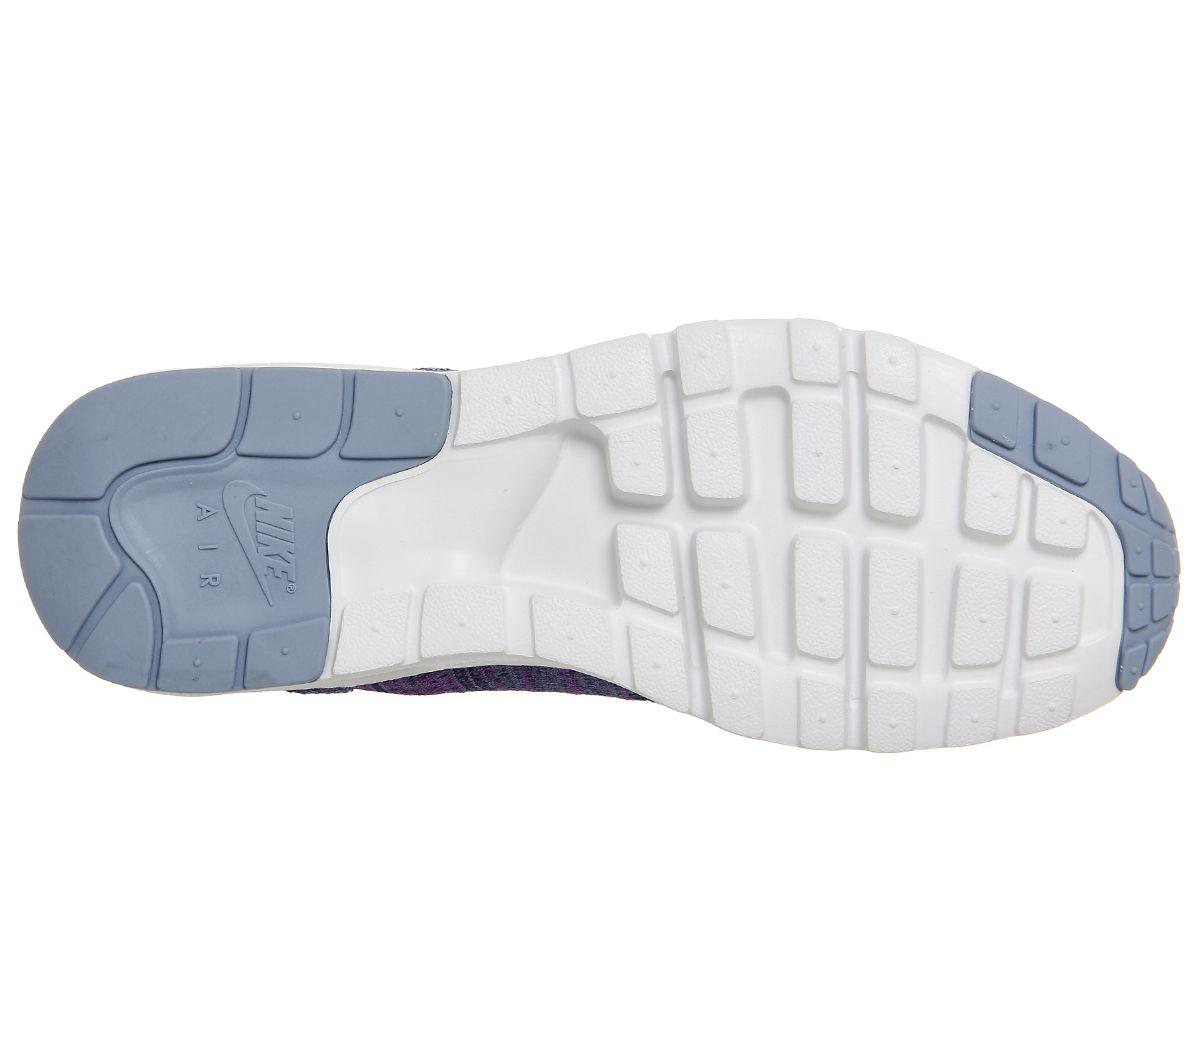 932b87697ae2 Nike Air Max 1 Ultra Flyknit Ocean Fog Navy Blue - junior